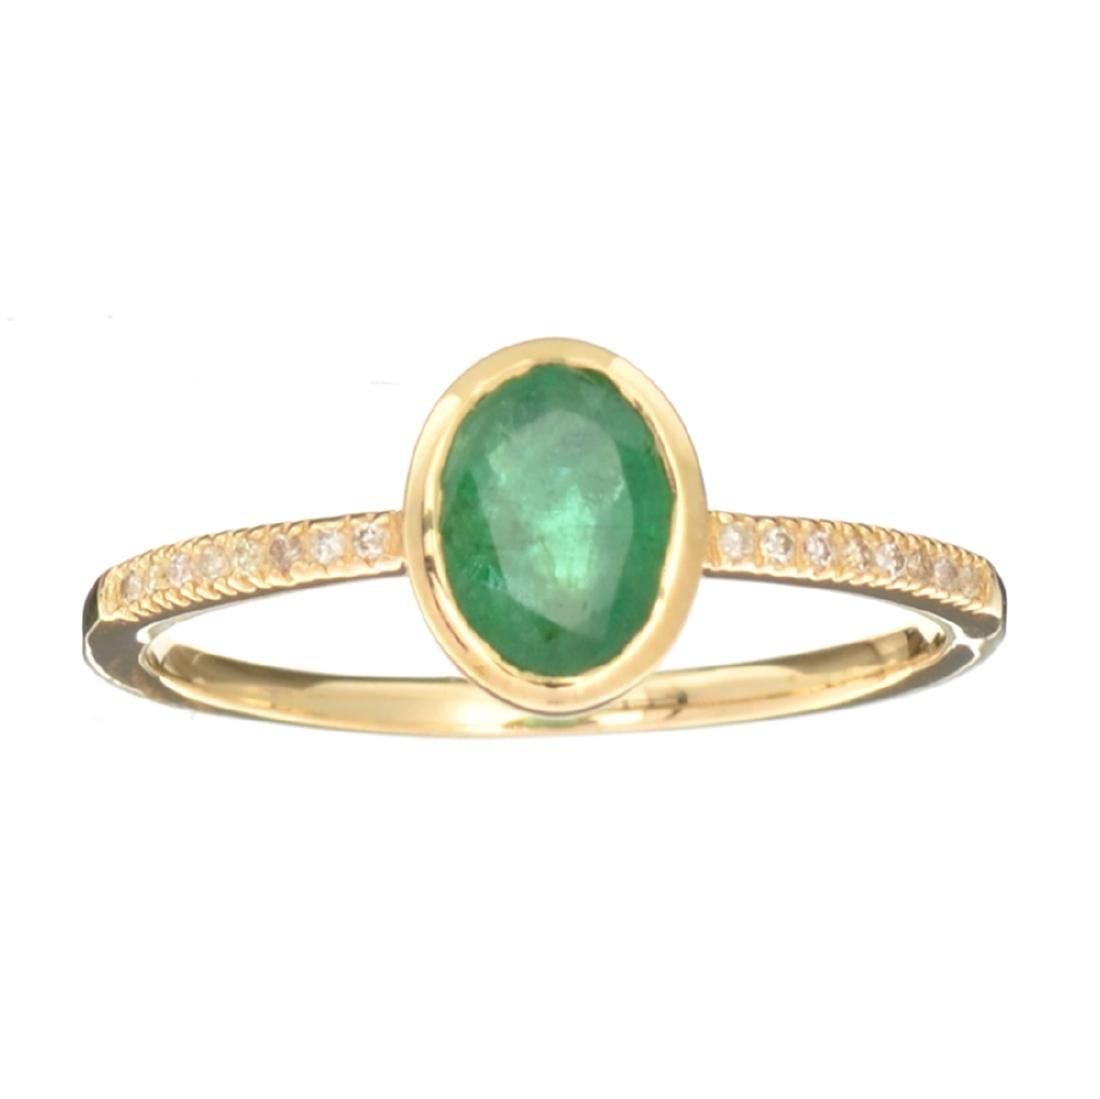 Designer Sebastian 14KT Gold 0.75CT Oval Cut Emerald